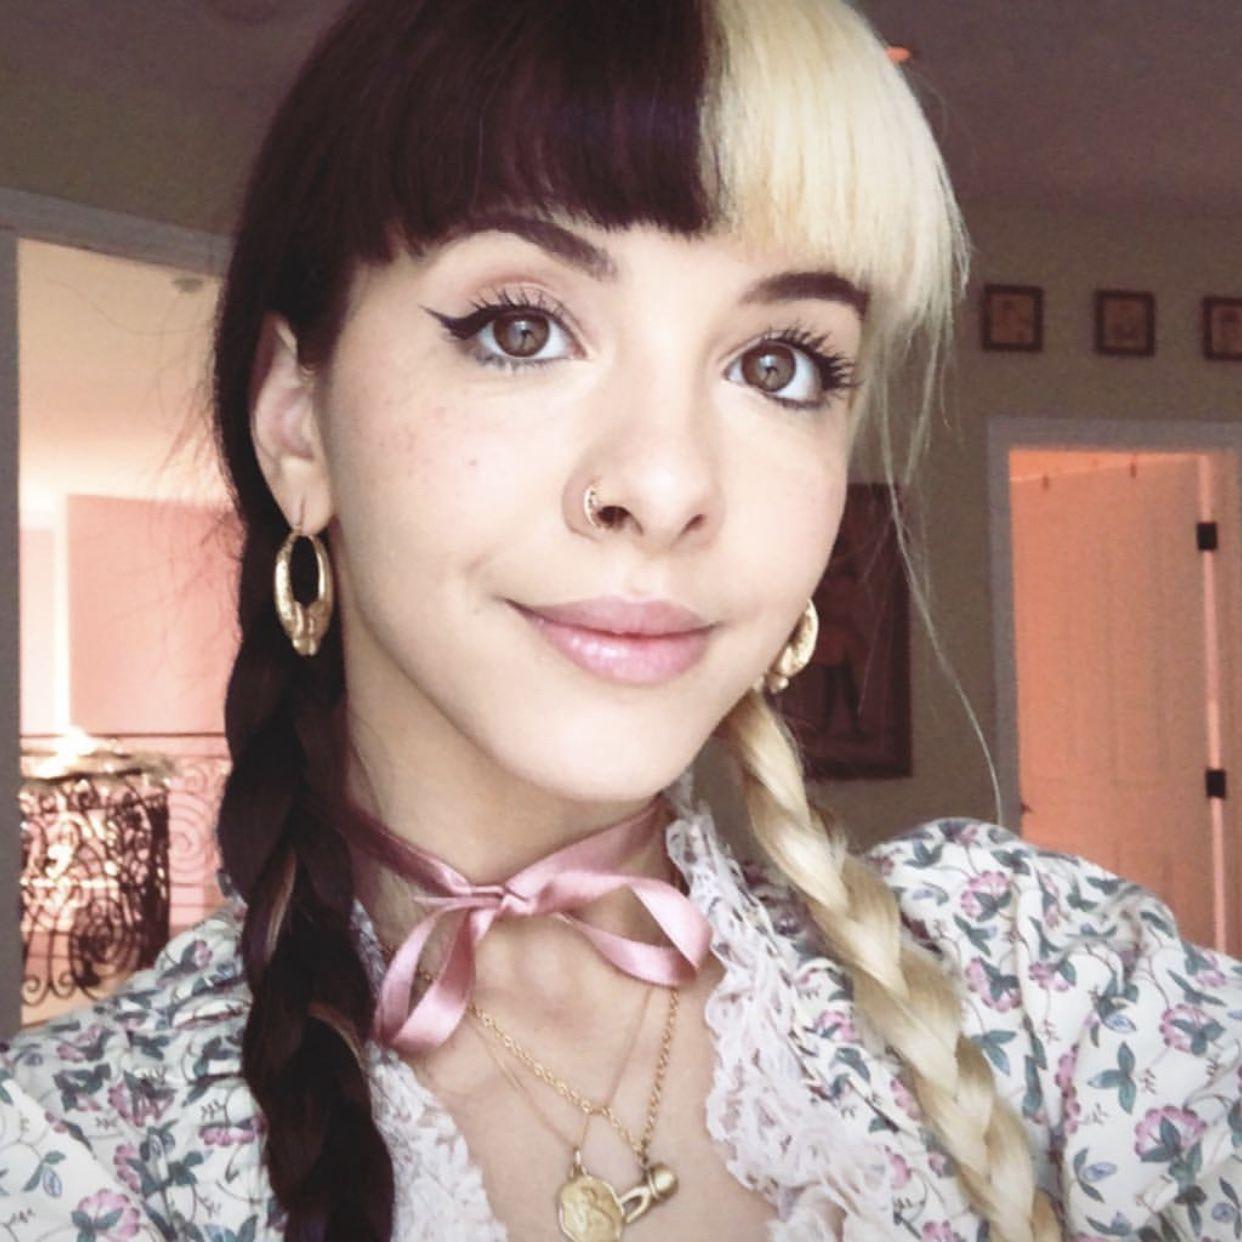 Pin By Brendons Forehead On Best Of Mel Melanie Martinez Melanie Martinez